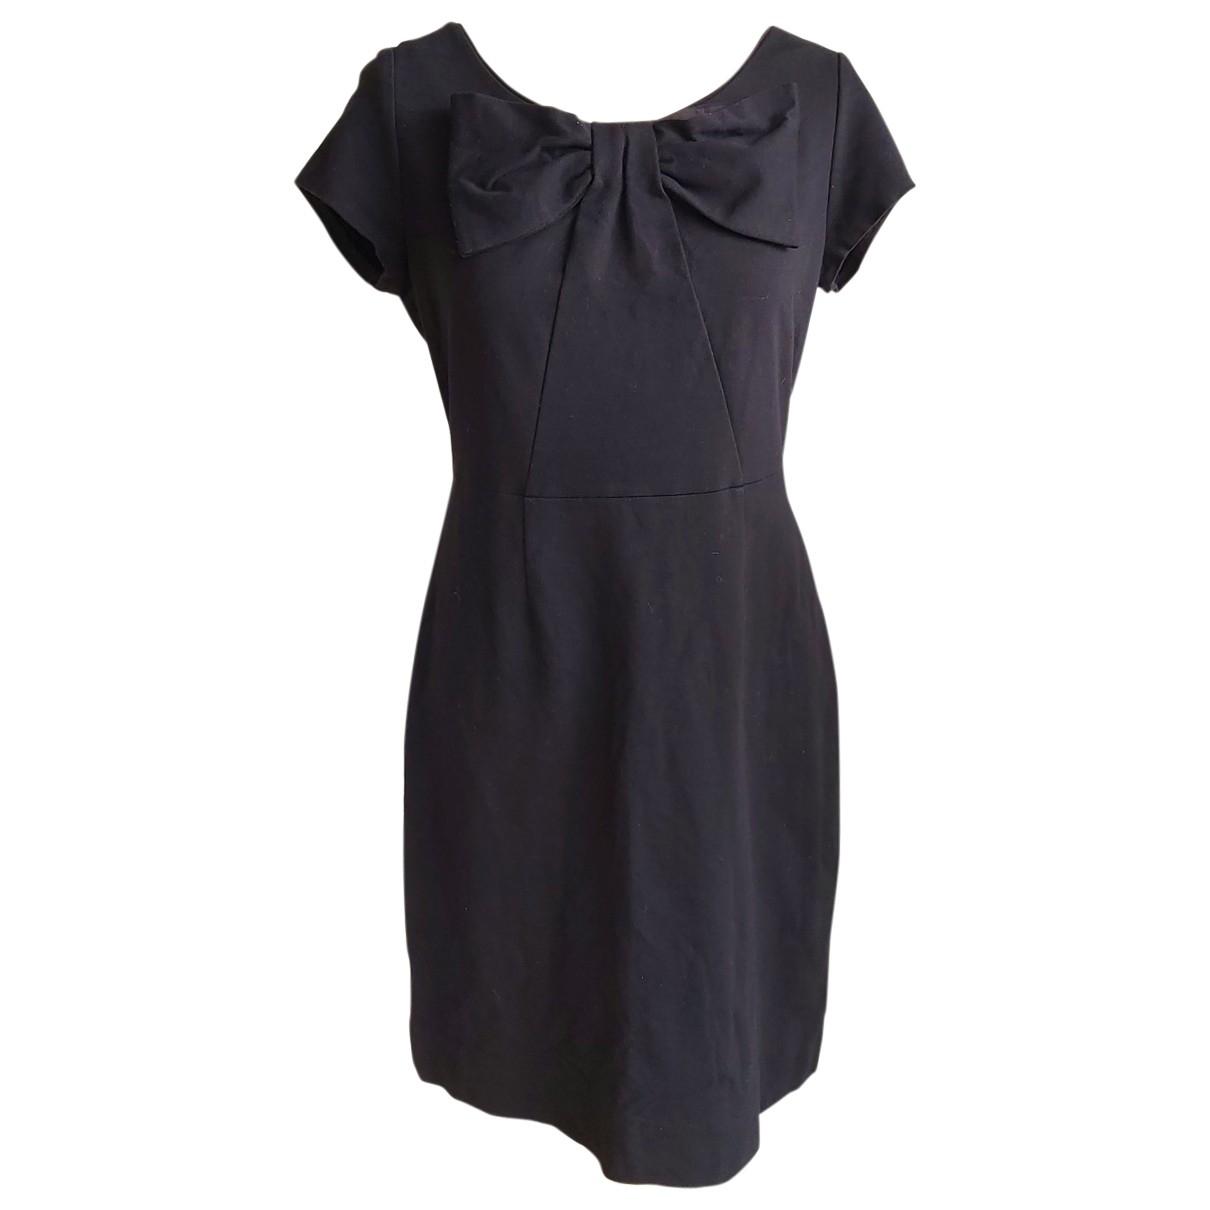 Kate Spade \N Black dress for Women 10 US